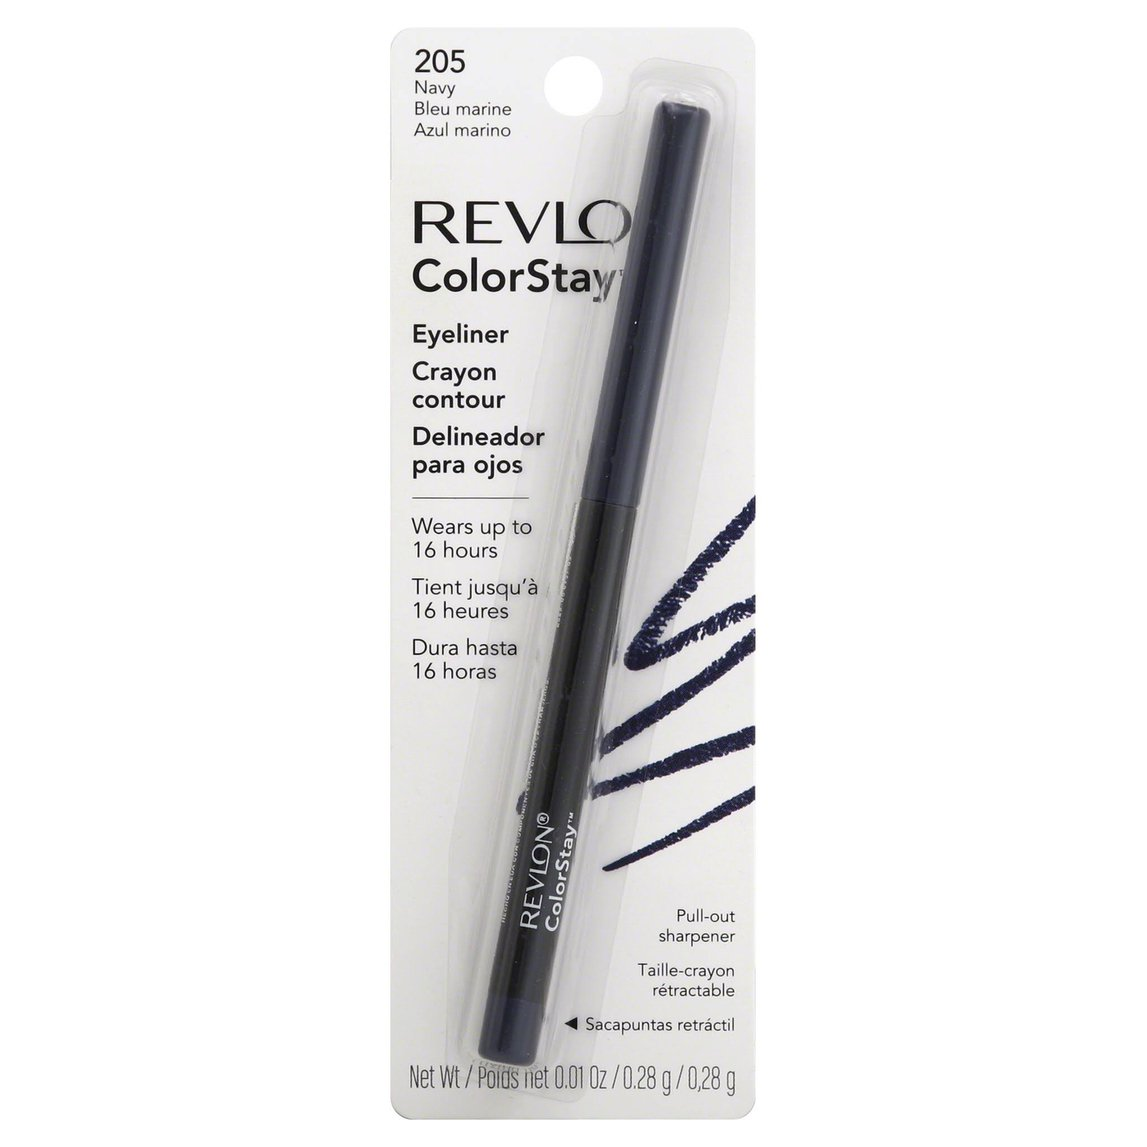 Revlon ColorStay Eyeliner with Sharpener, Navy 205, 0.01 Oz (28 g)